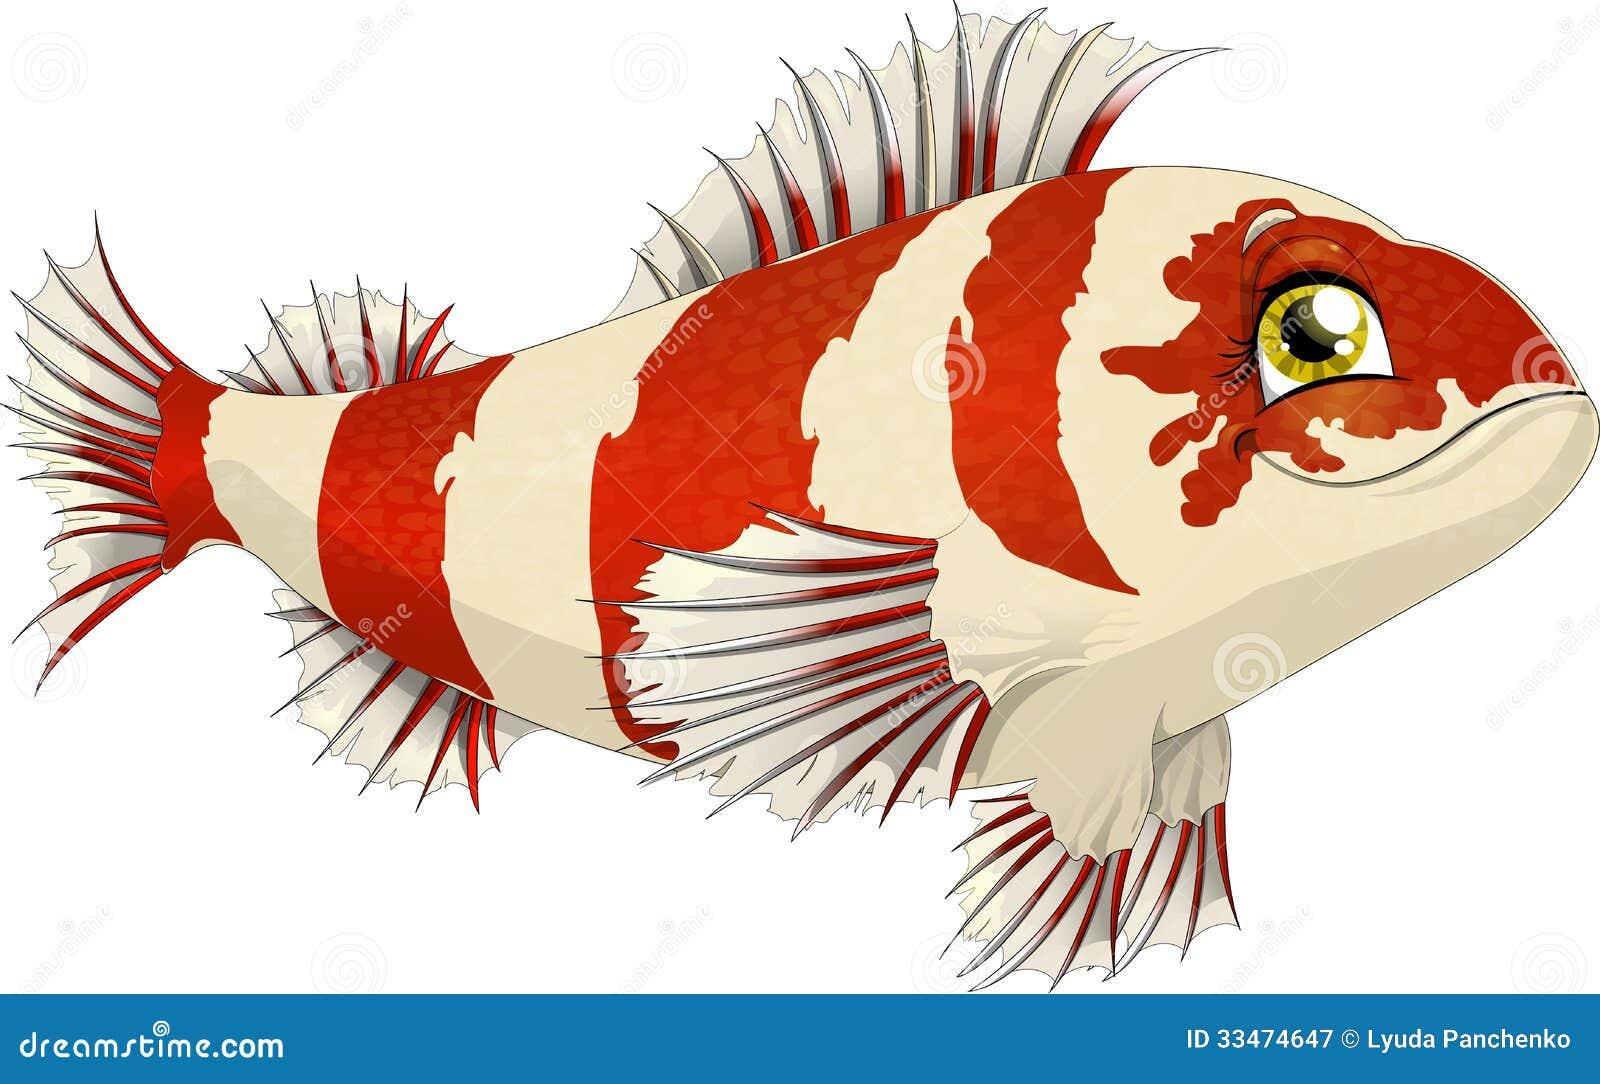 Fish Royalty Free Stock Photography Image 33474647